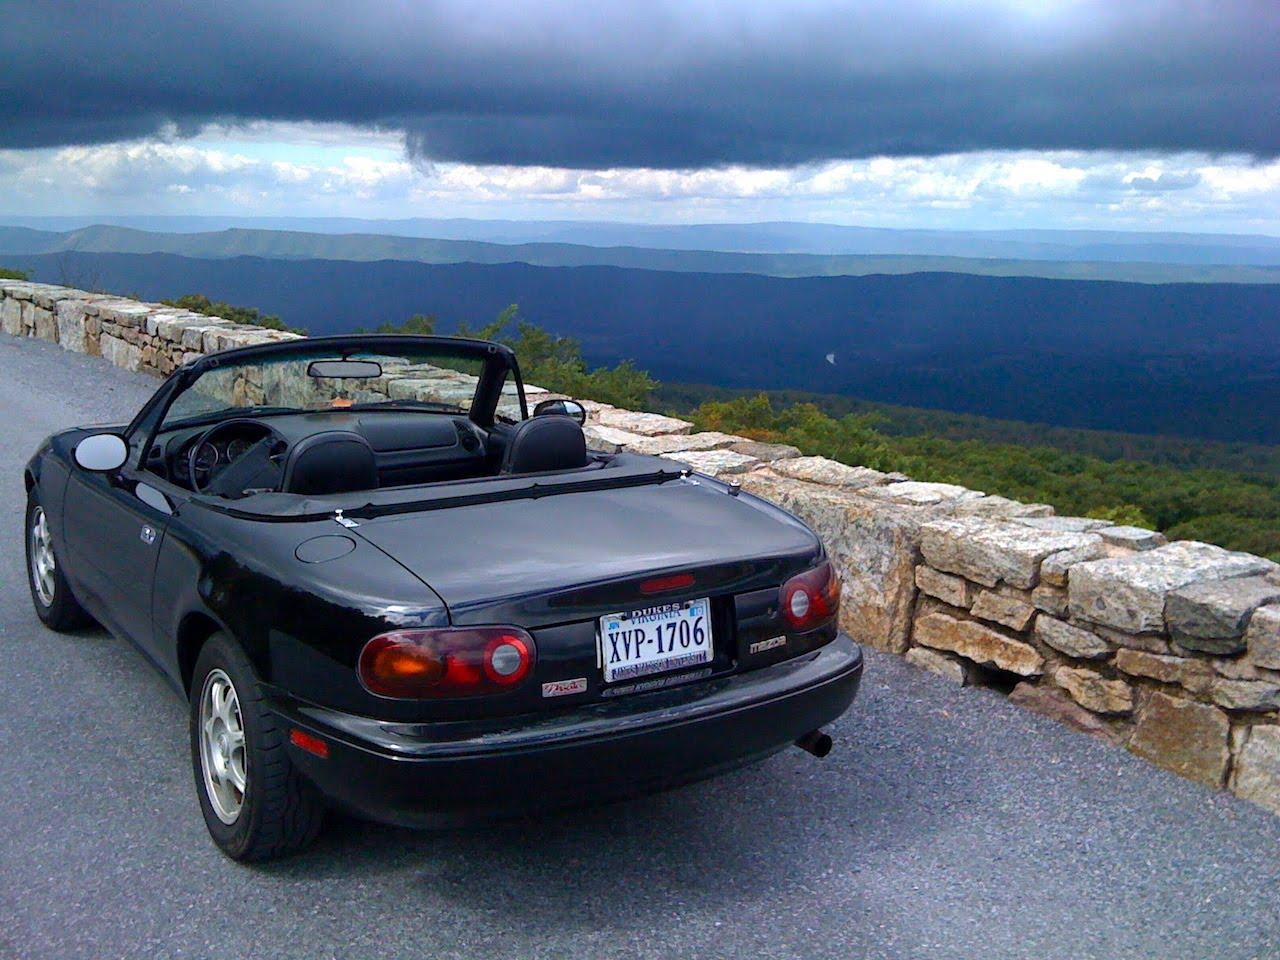 1995 Mazda Miata Blue Ridge Parkway